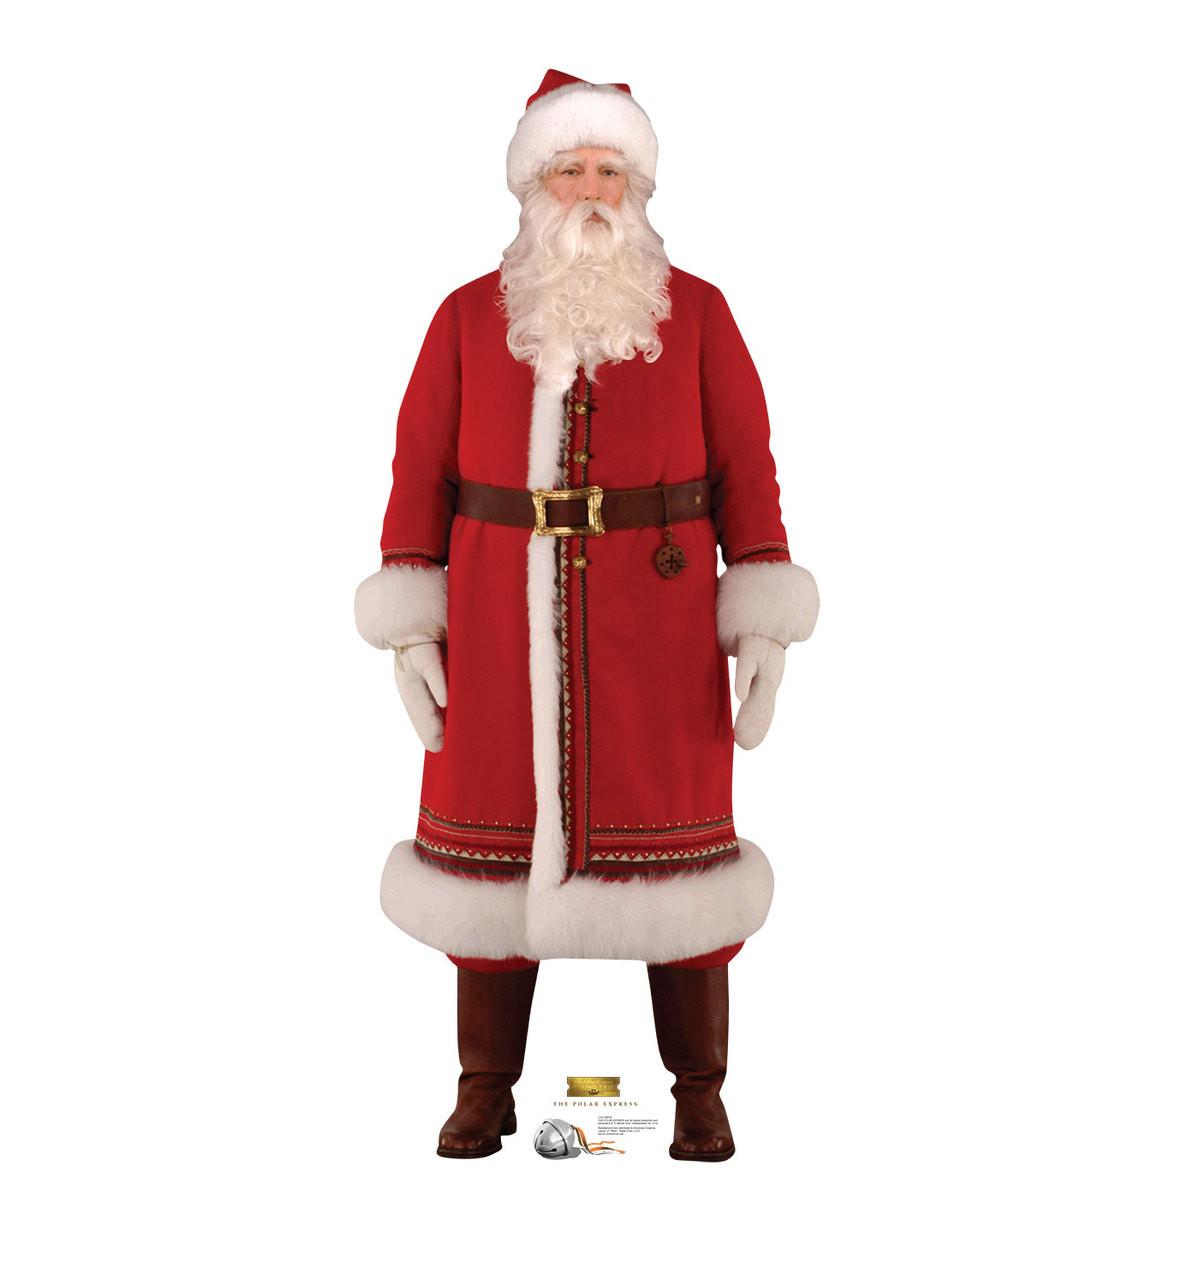 Life-size Santa - The Polar Express Cardboard Standup